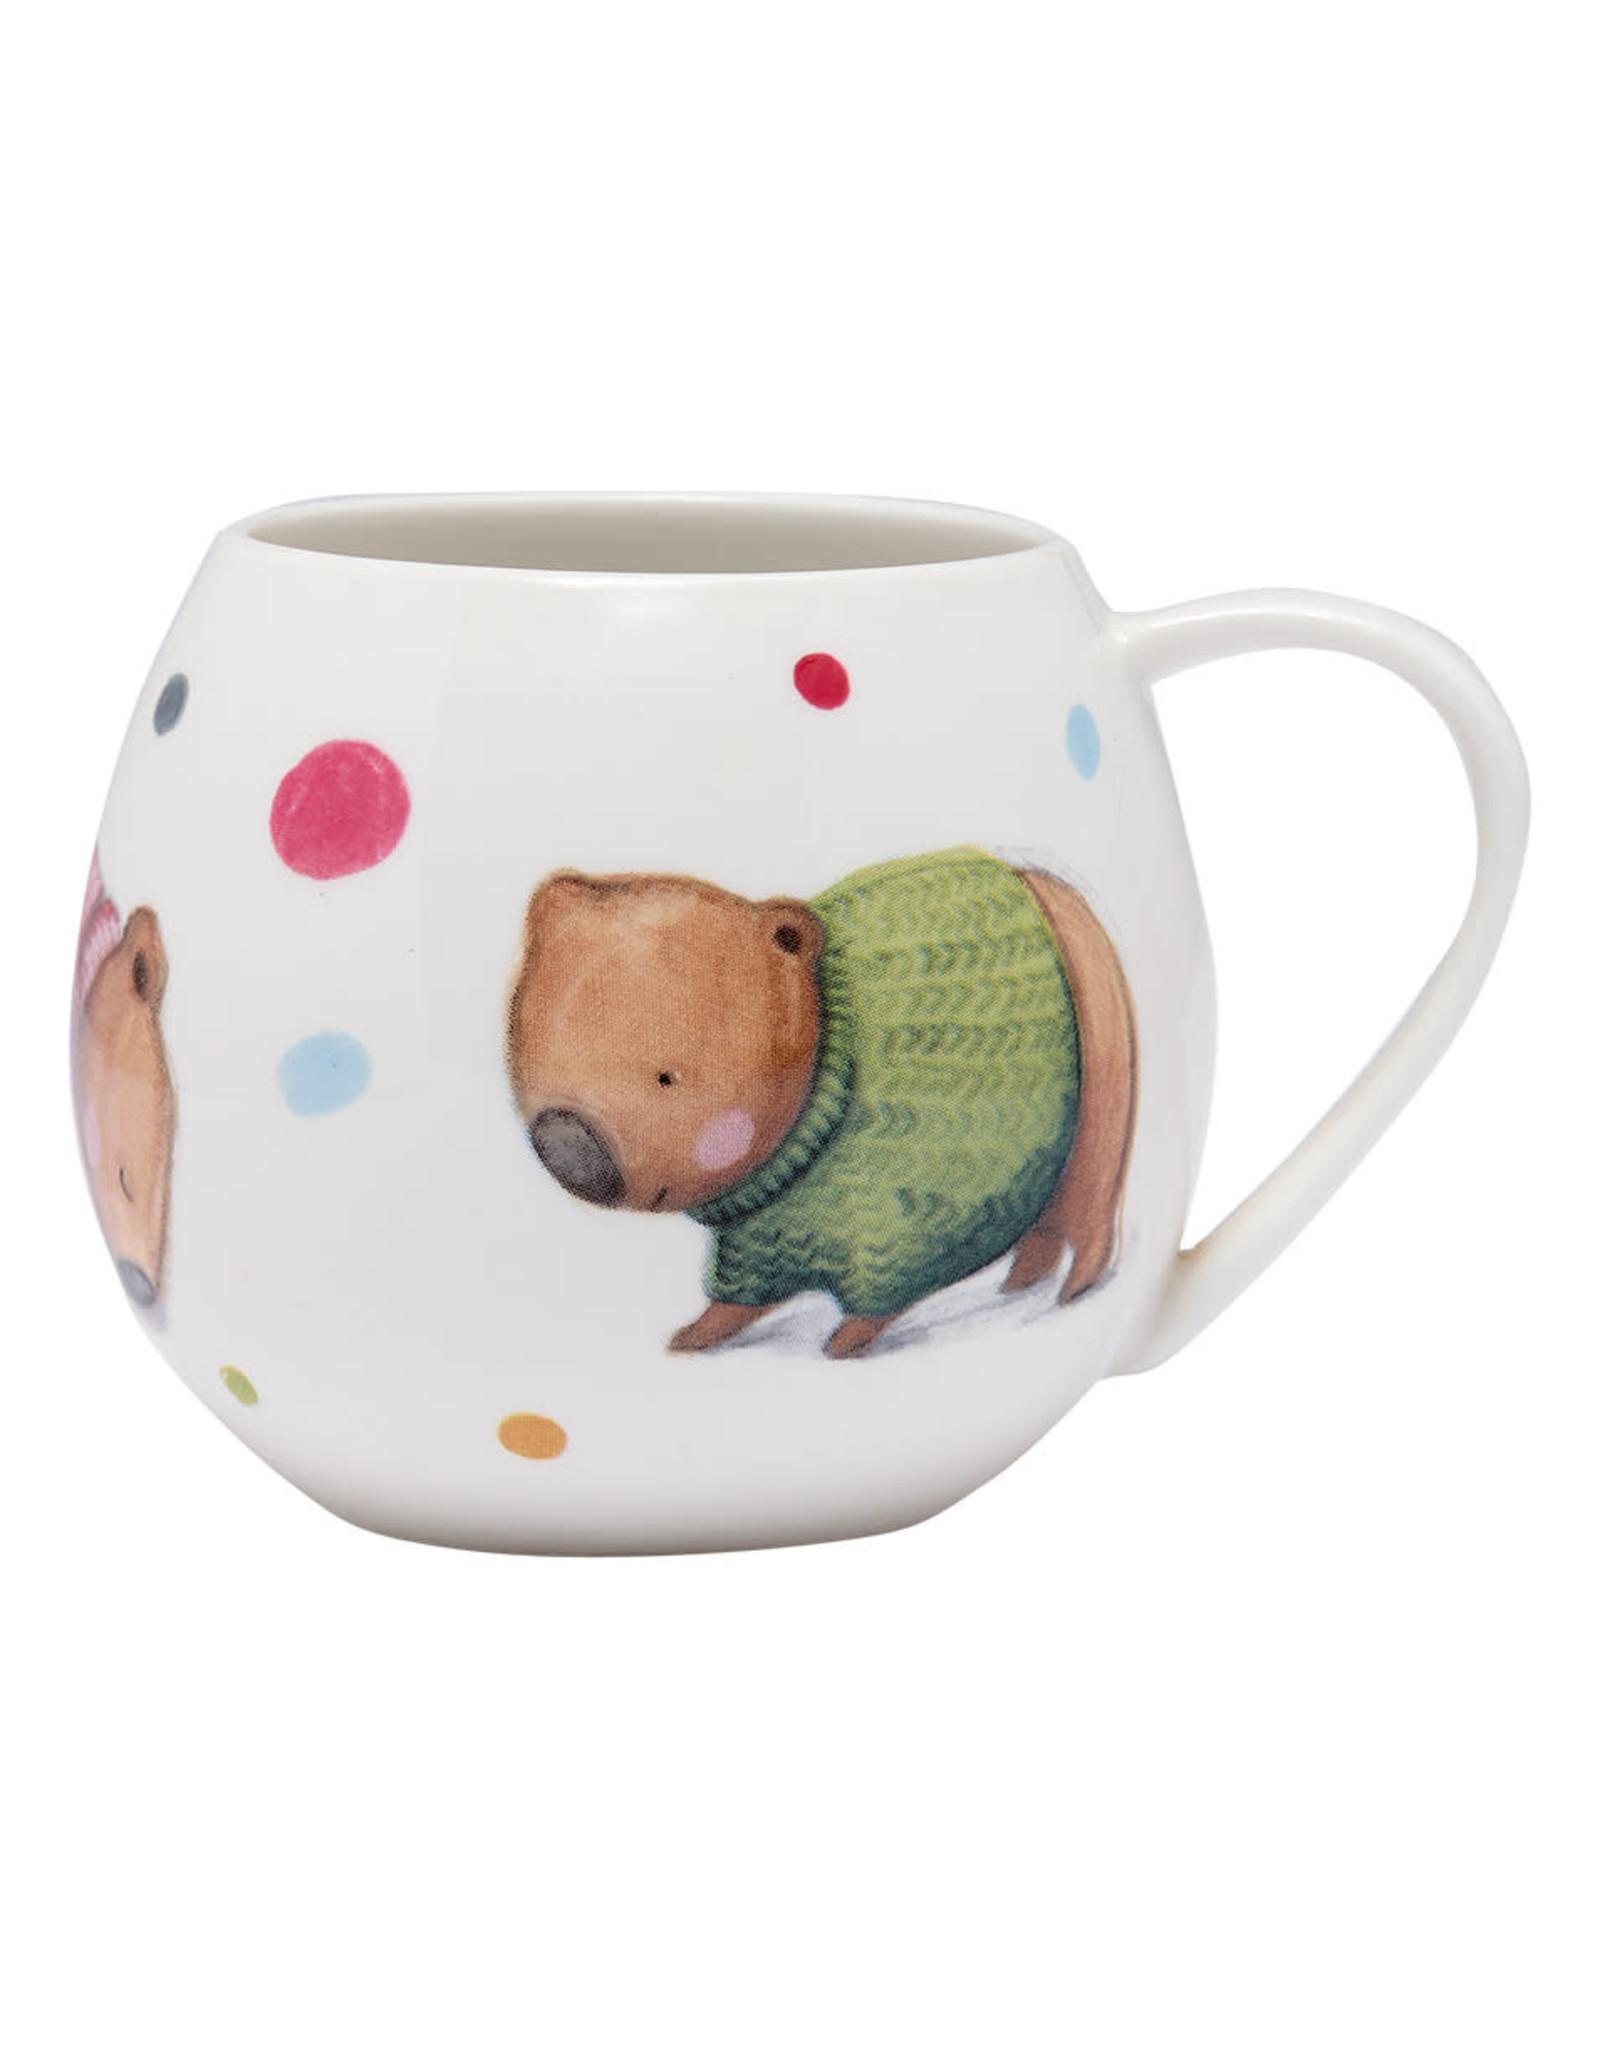 Ashdene Barney Gumnut & Friends Wombat Mug